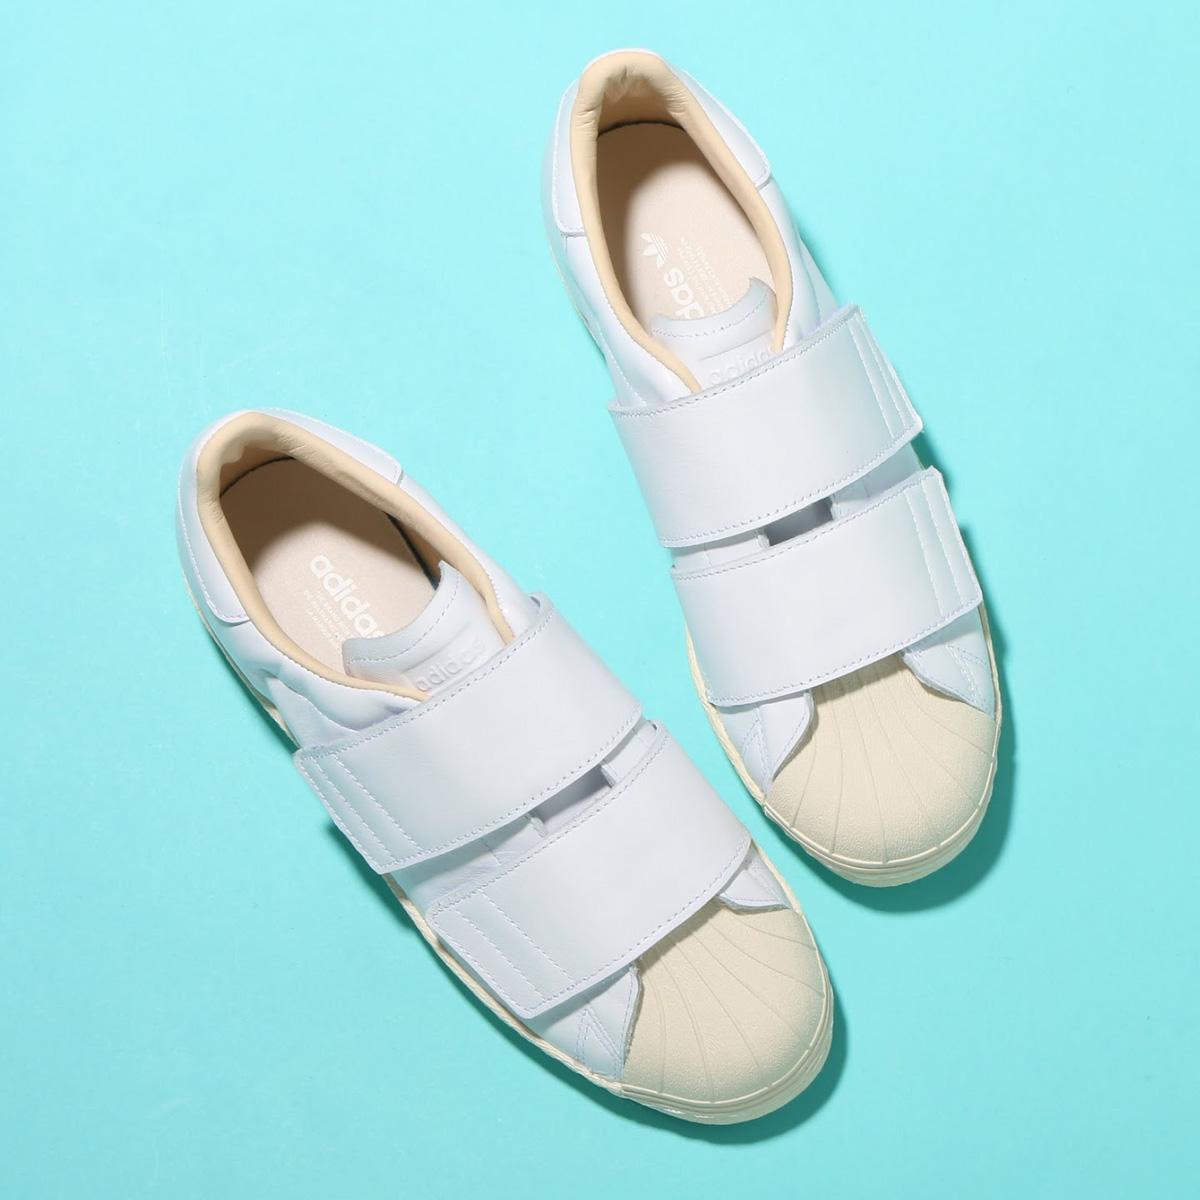 adidas Originals SS 80s VELCRO W(アディダス オリジナルス スーパースター 80s ベルクロ W)Running White/Running White/Linen【レディース スニーカー】18FW-S